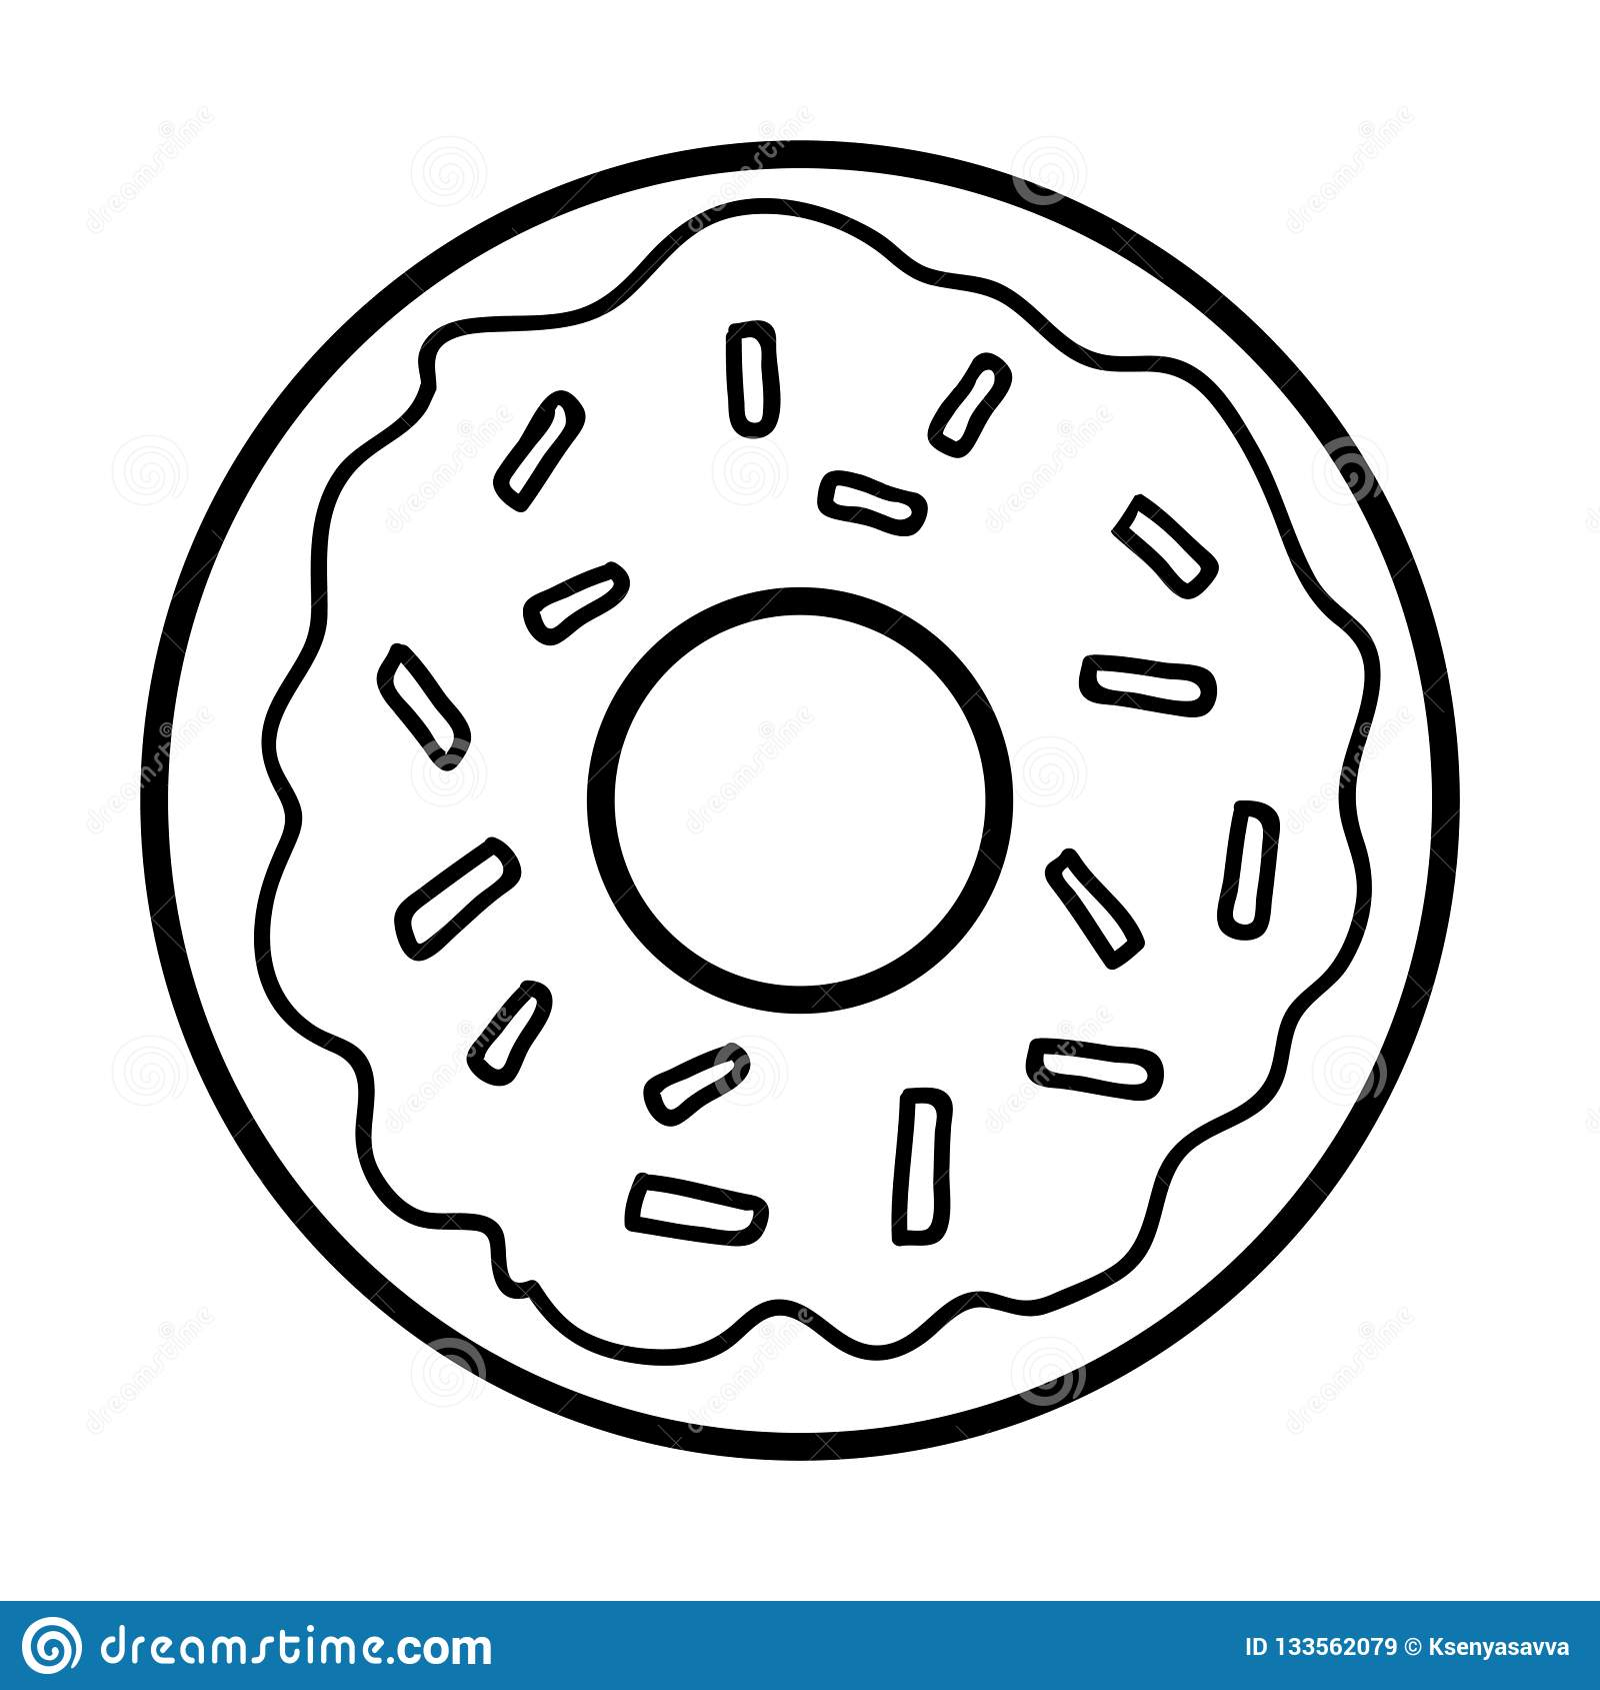 - Coloring Book, Donut Stock Vector. Illustration Of Breakfast - 133562079